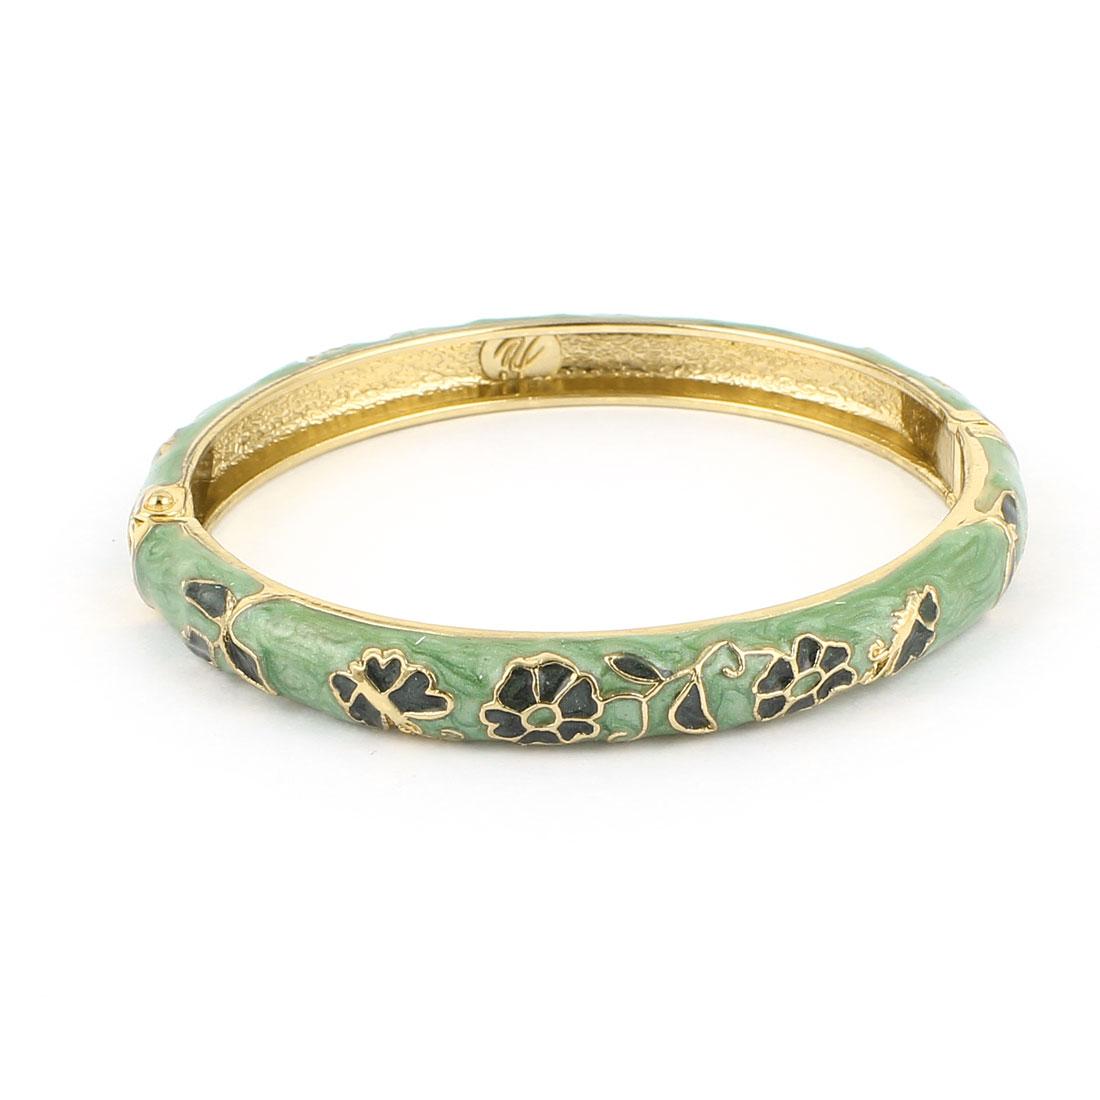 Lady Girl 2.3-inch Dia Olive Green Wrist Cuff Enamel Bracelet Bangle